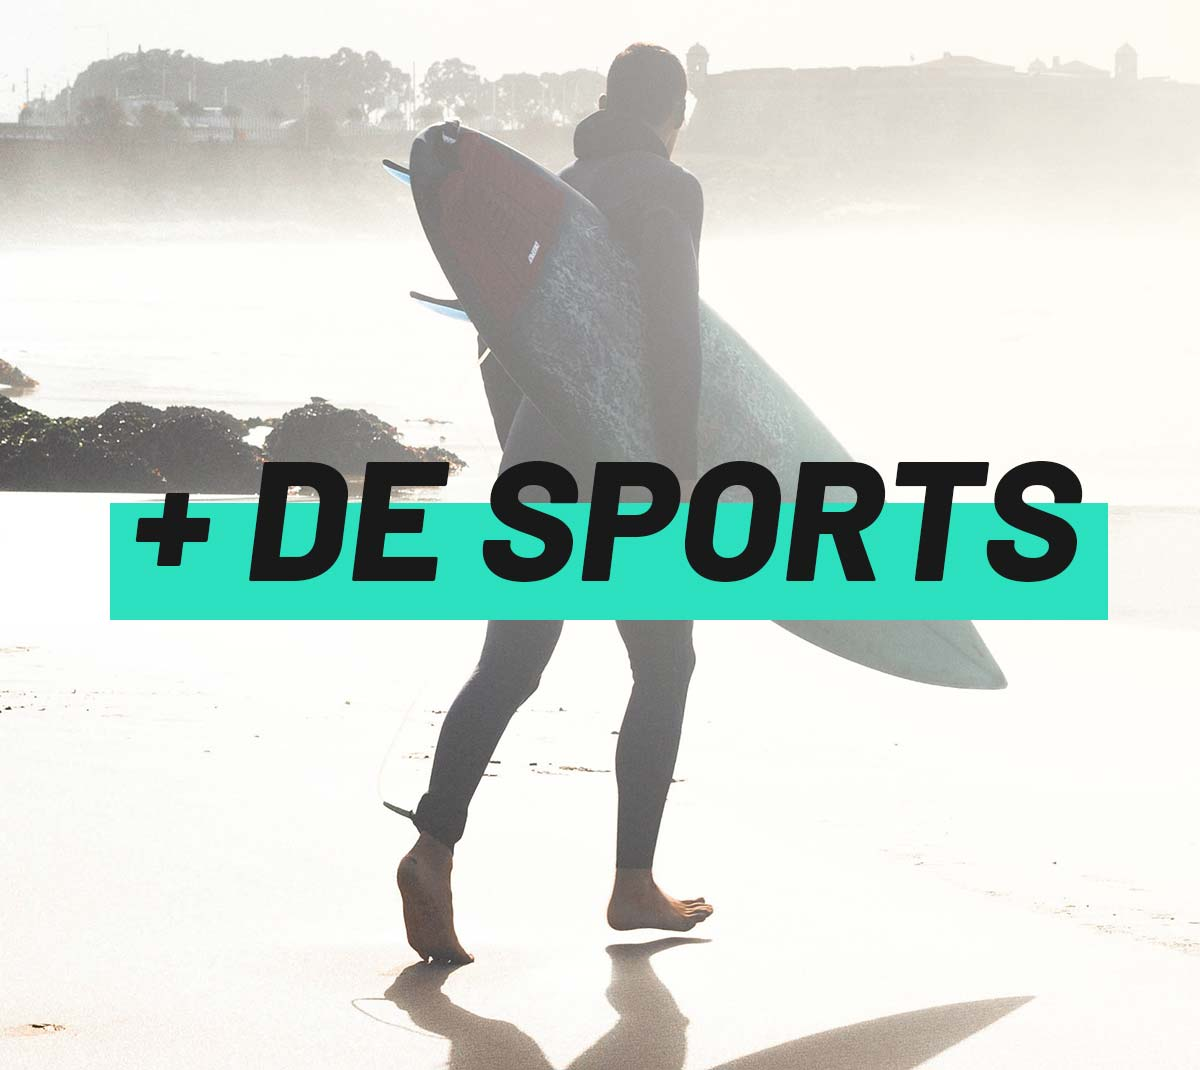 + de sports